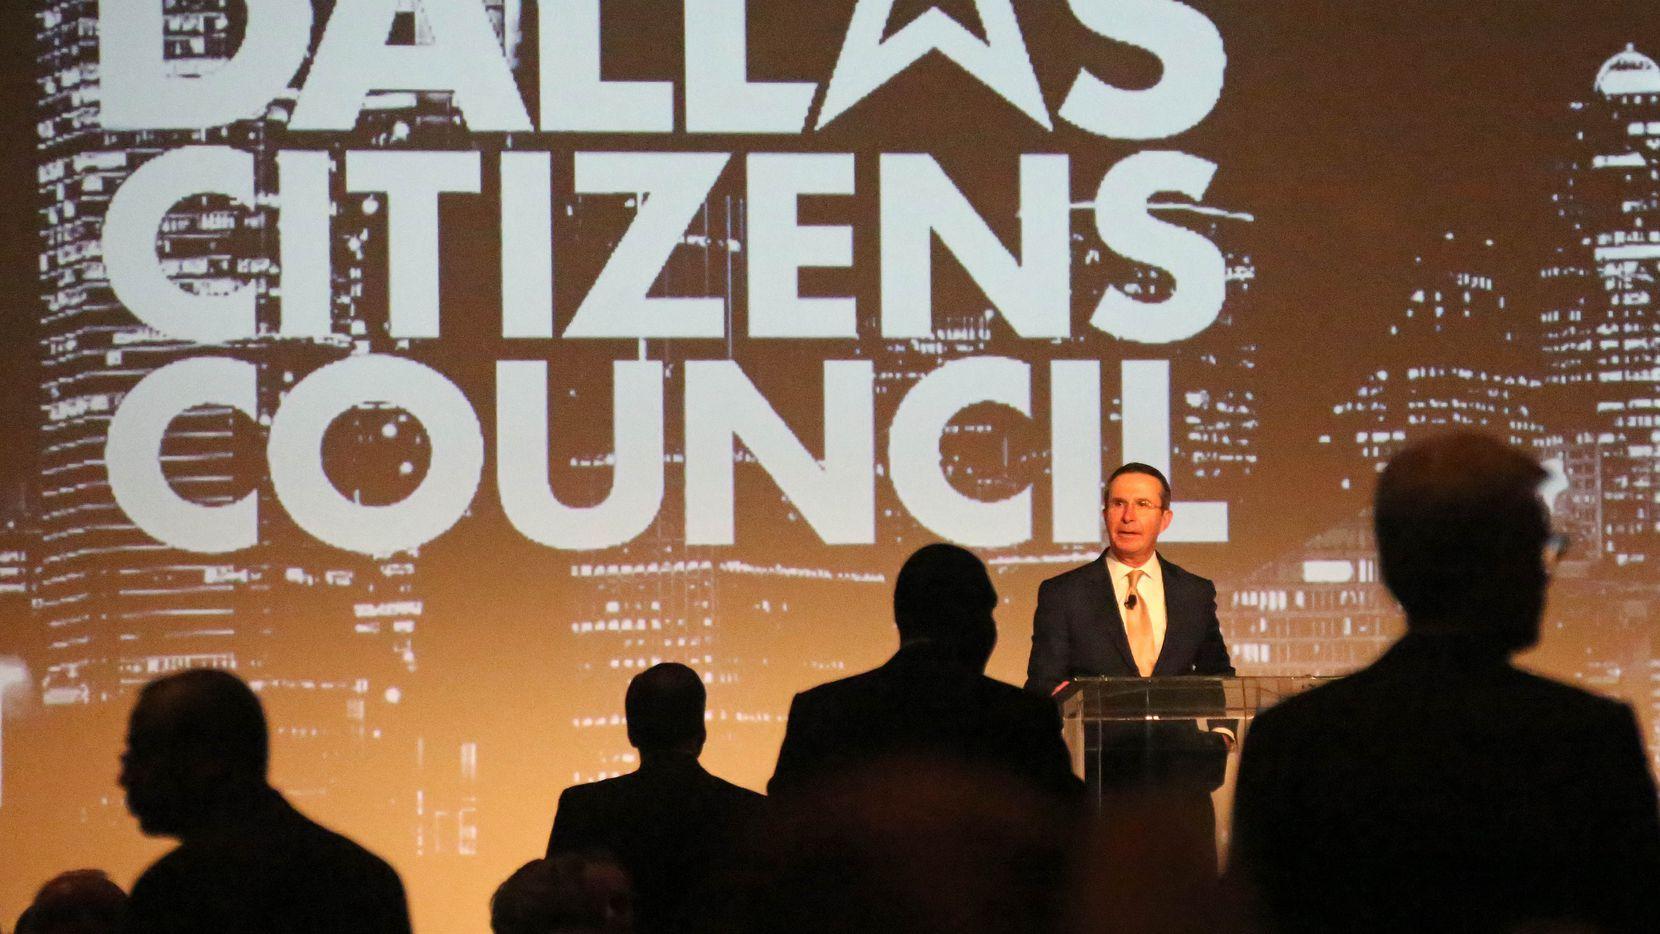 Chairman of the Dallas Citizens Council Clint McDonnough greets the crowd at the Dallas Citizens Council luncheon held at the Omni Dallas Hotel in Dallas on Nov. 30, 2016.